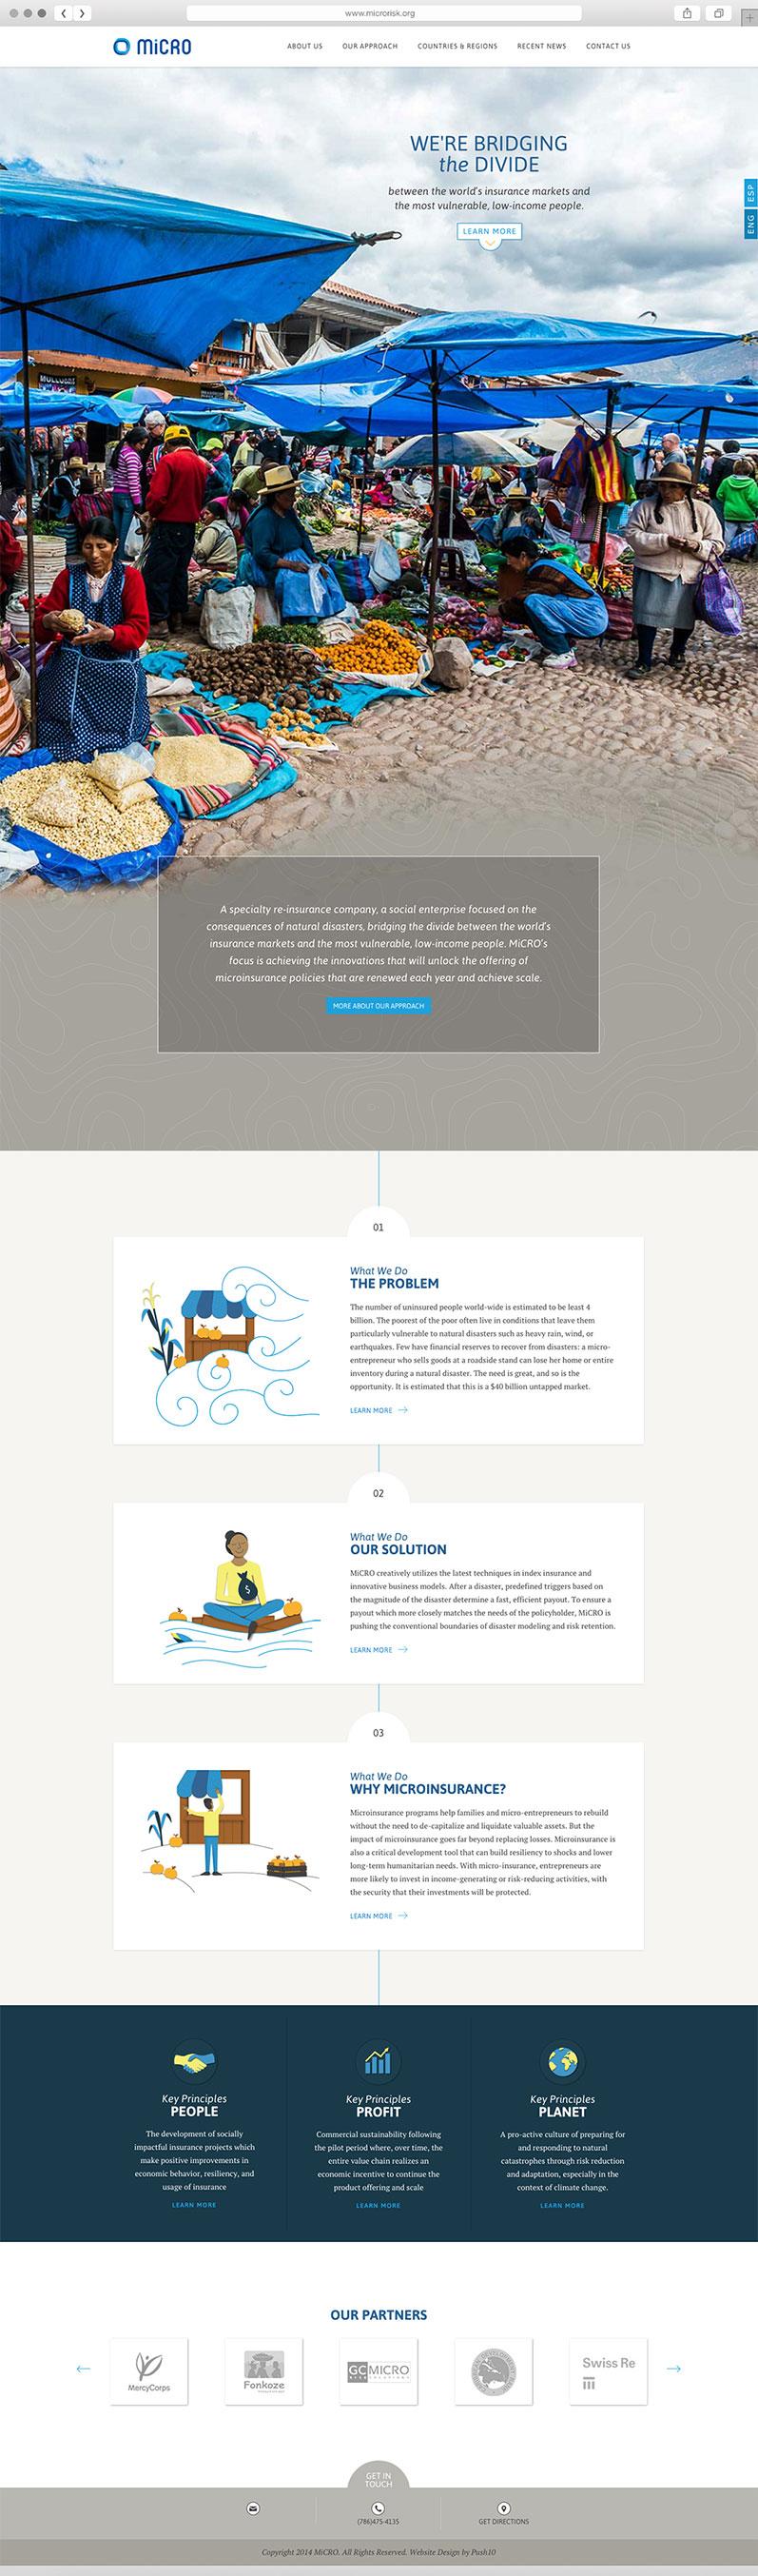 Responsive website interface design for Philadelphia insurance company